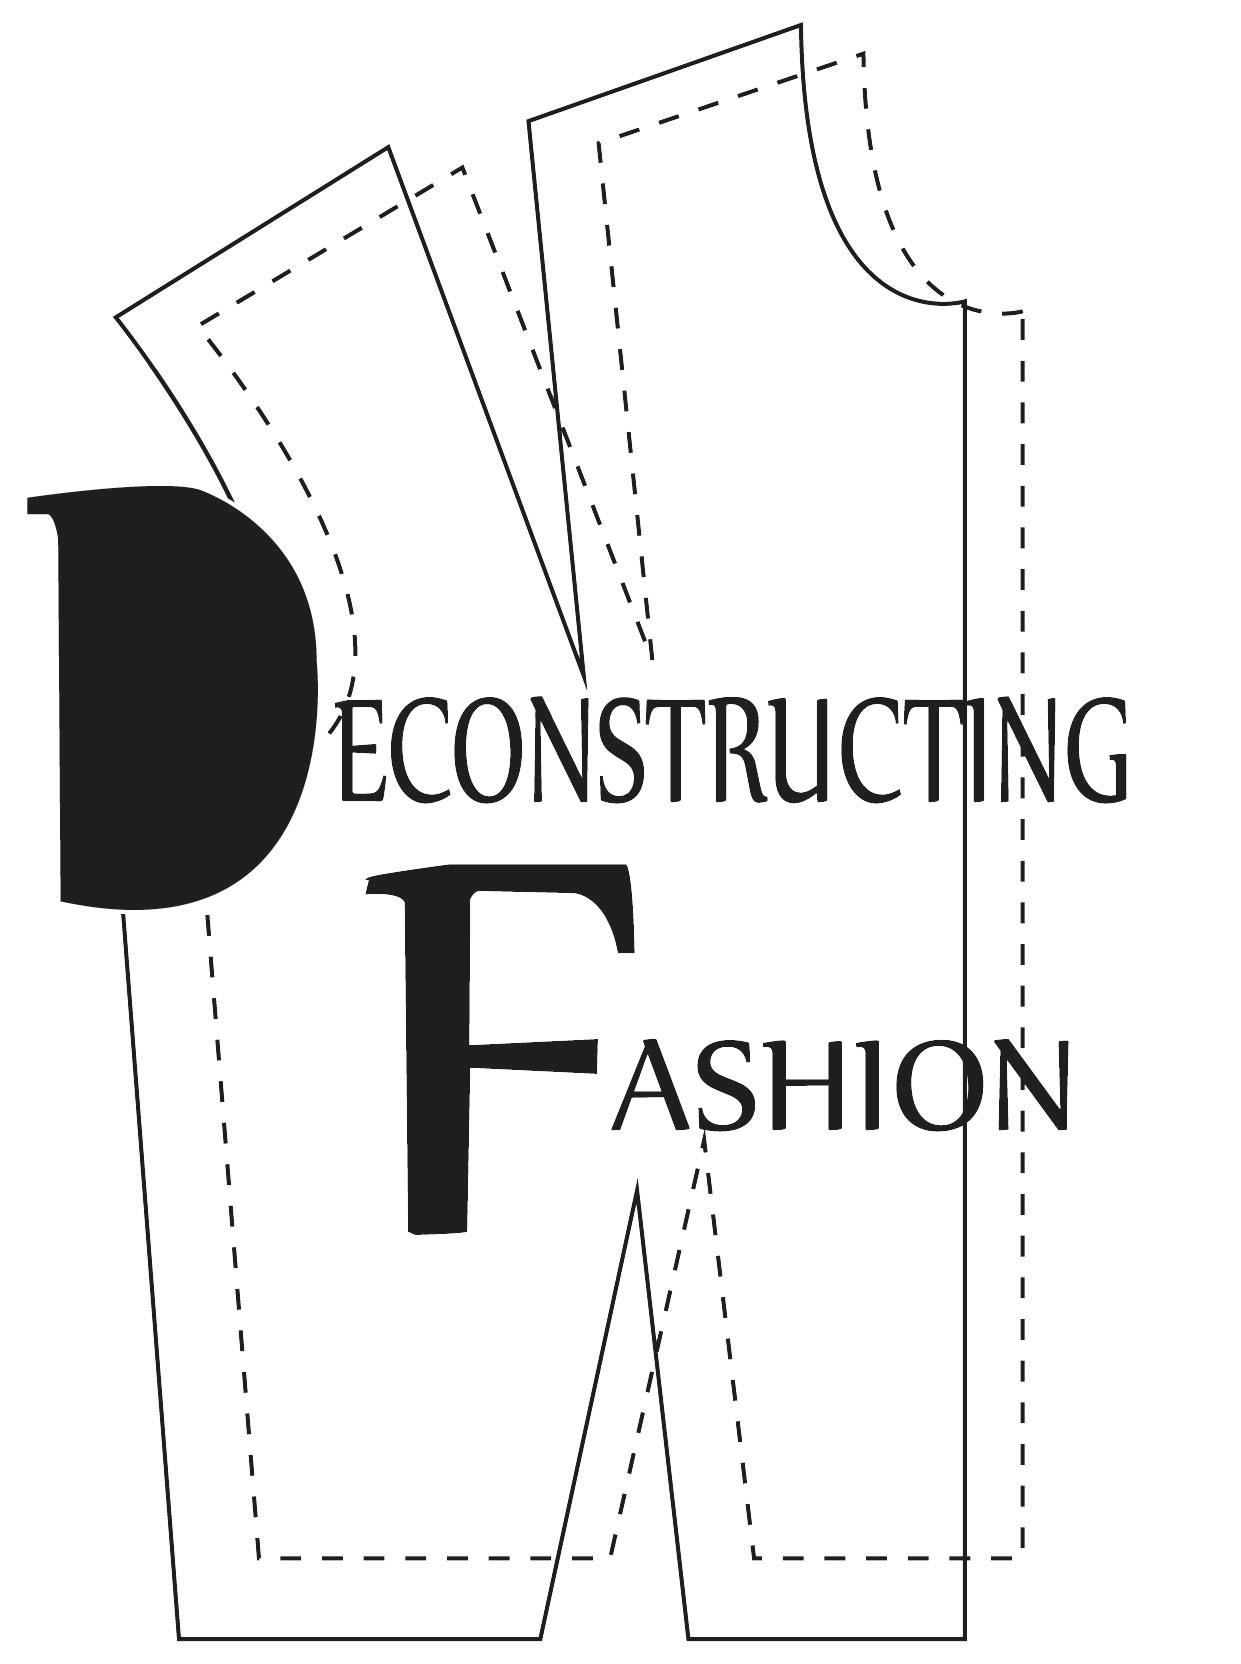 Deconstructing Fashion Podcast